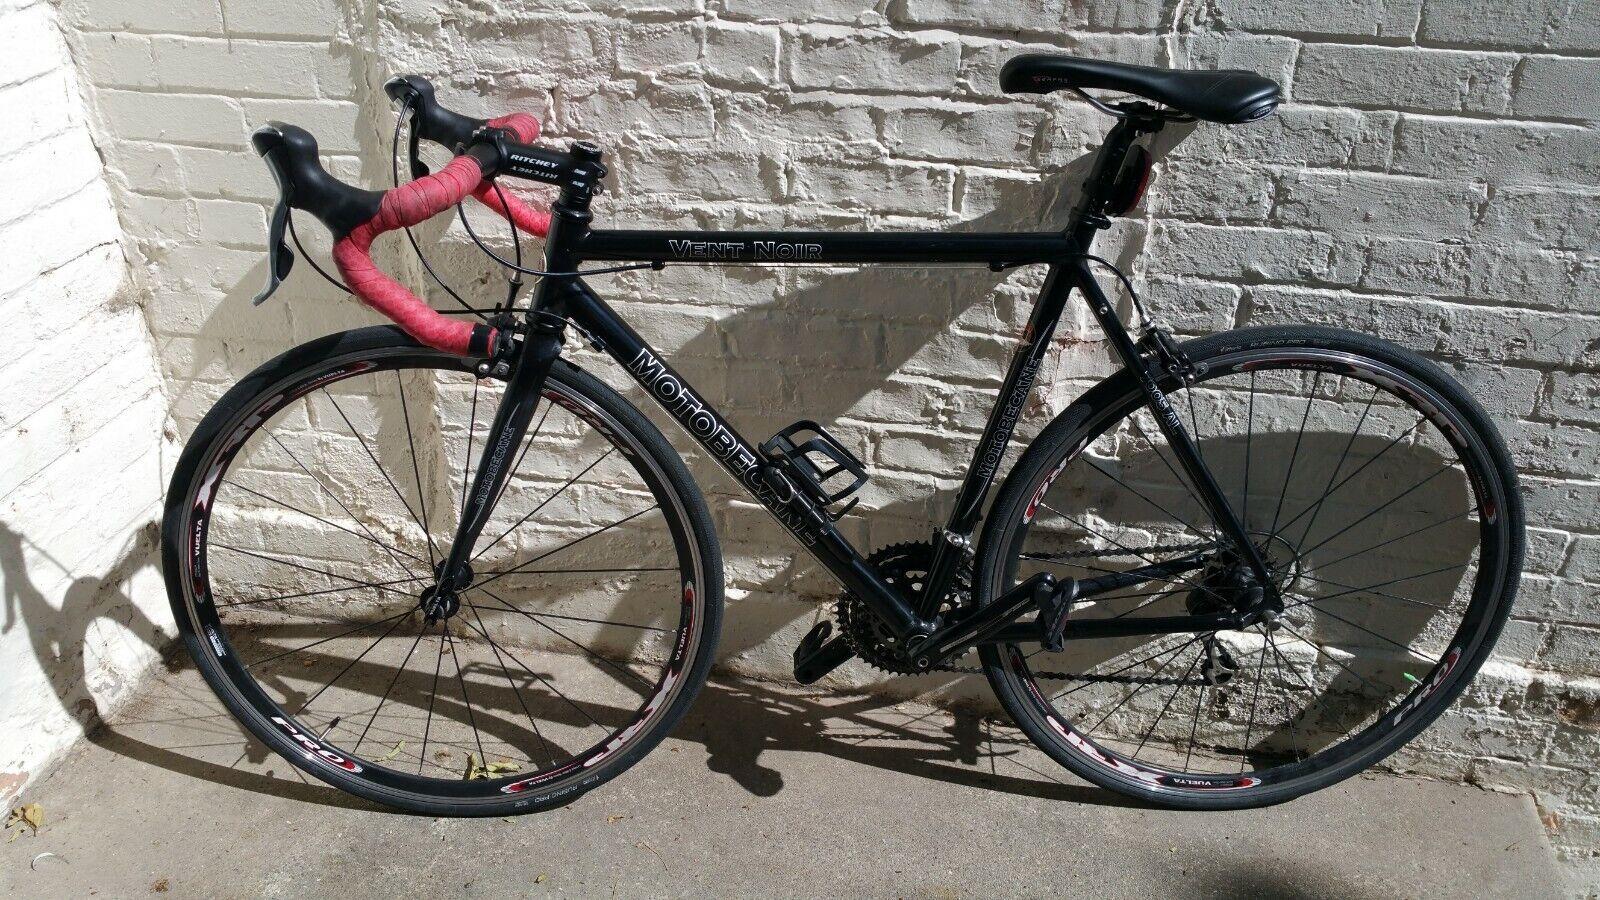 56cm 27-Speed Motobecane Vent black Road Bike